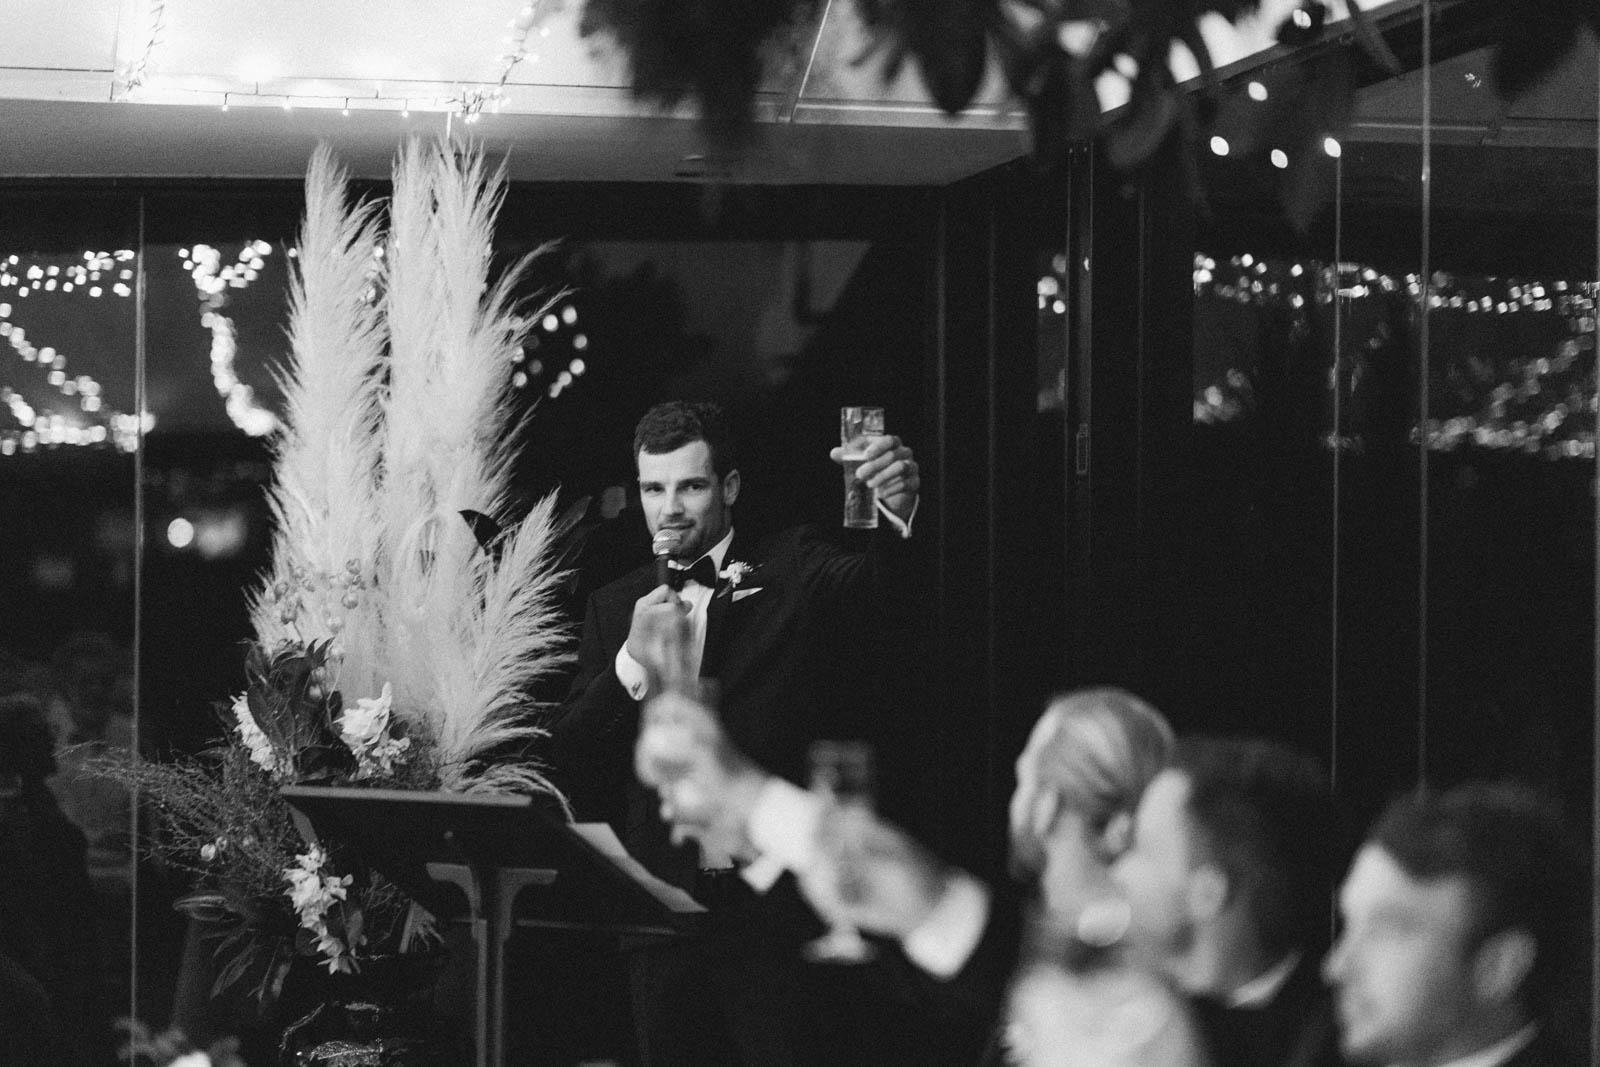 newfound-s-p-mt-maunganui-tauranga-wedding-photographer-2144-A9_09728